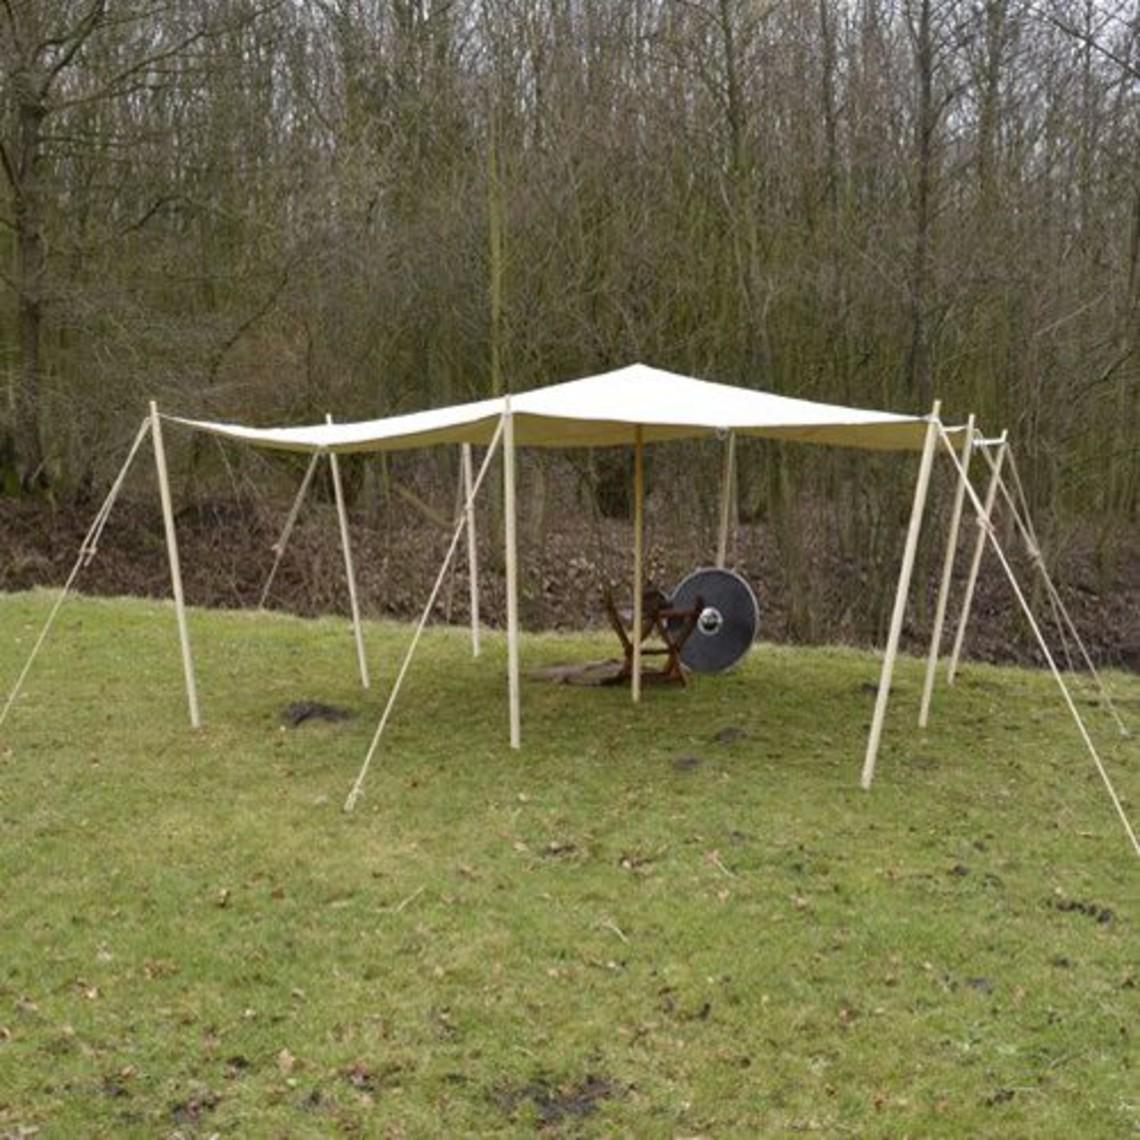 Luifel 3 x 5 m 350 g/m²